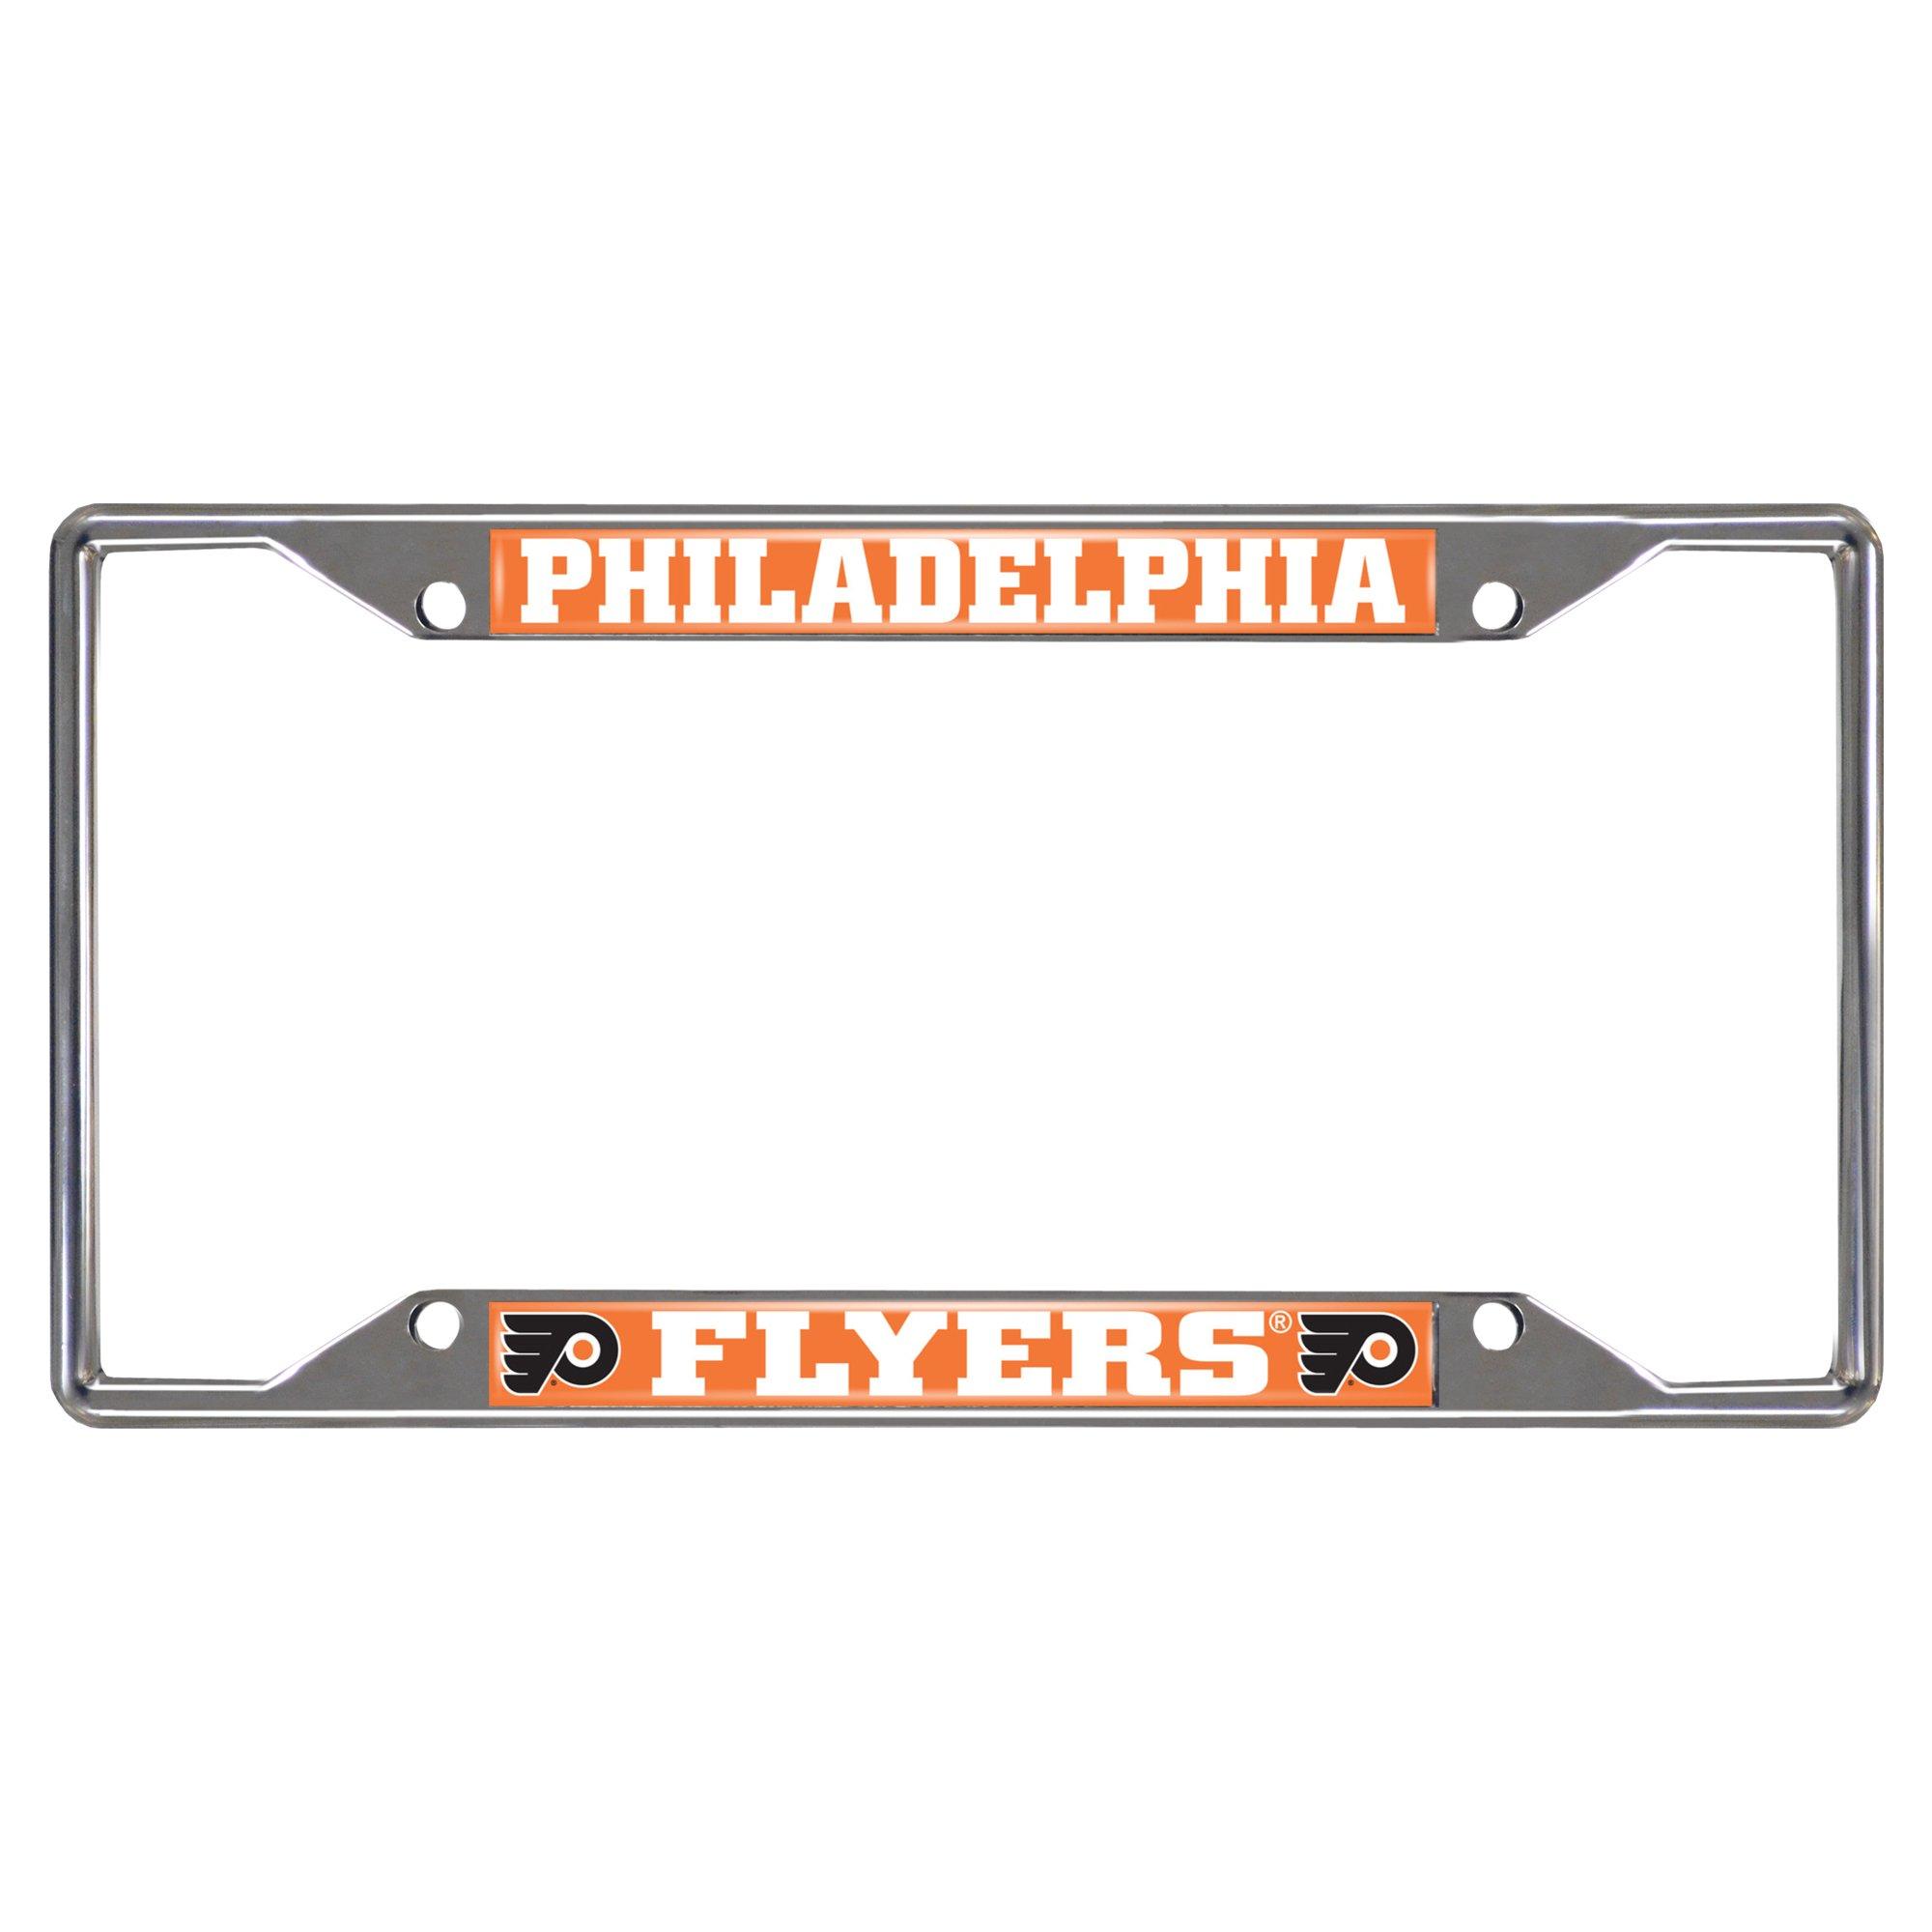 FANMATS 14883 NHL Philadelphia Flyers Chrome License Plate Frame by Fanmats